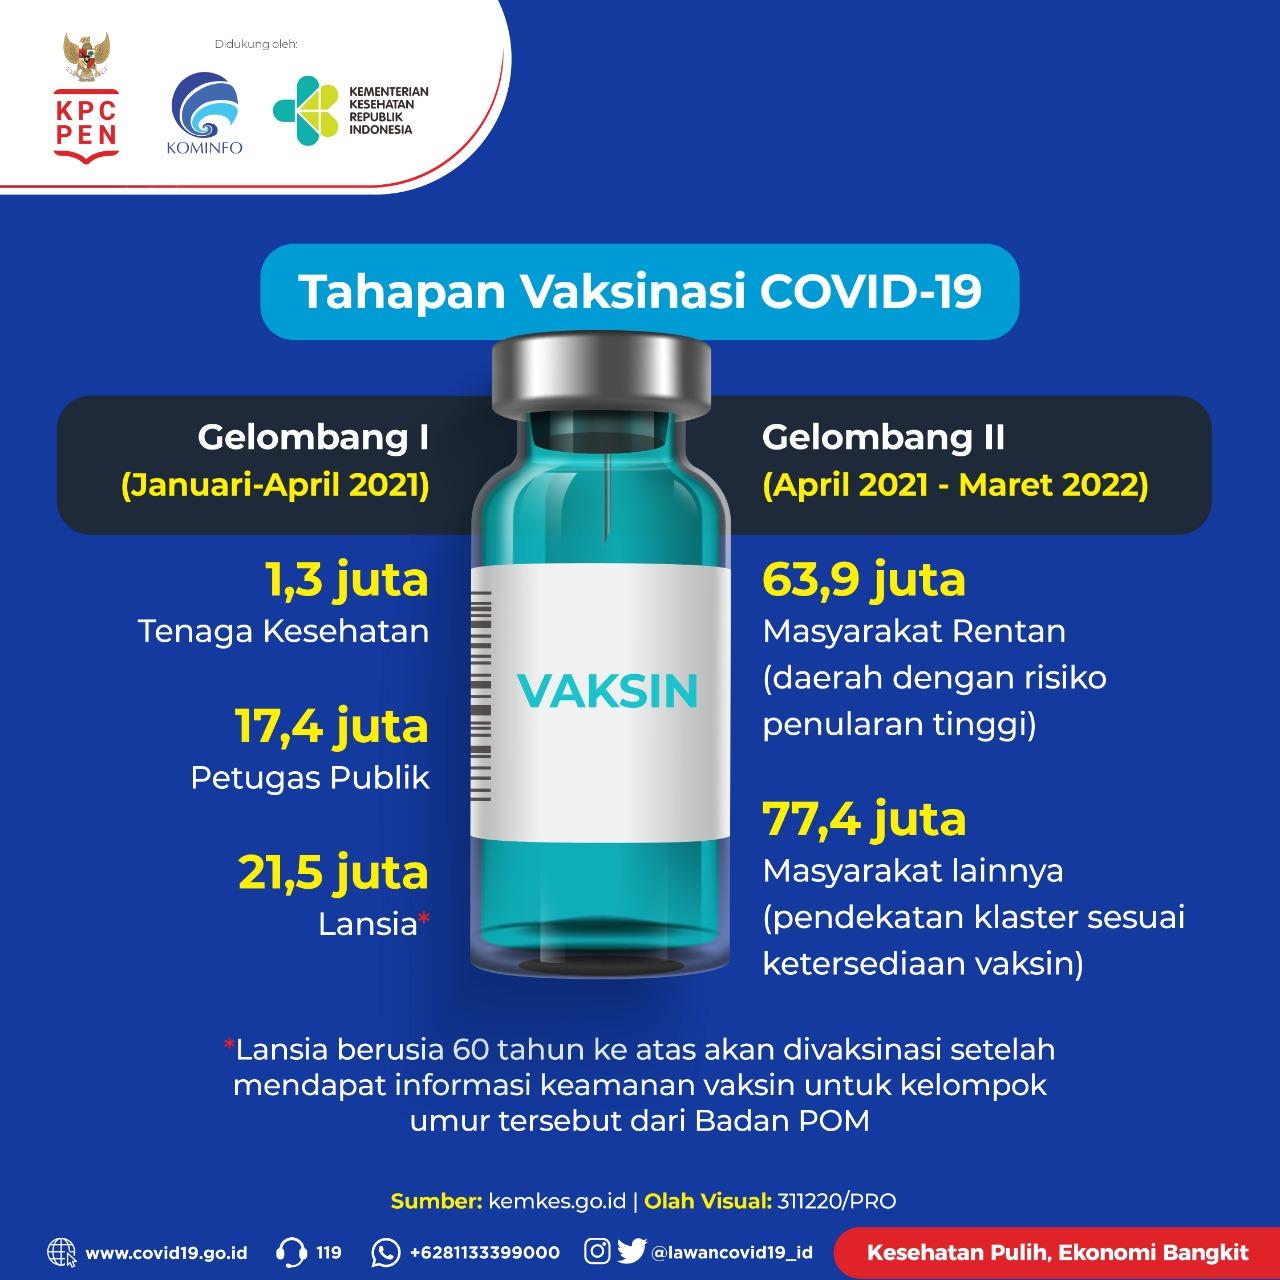 Inilah-Tahapan-Vaksinasi-COVID-19-2